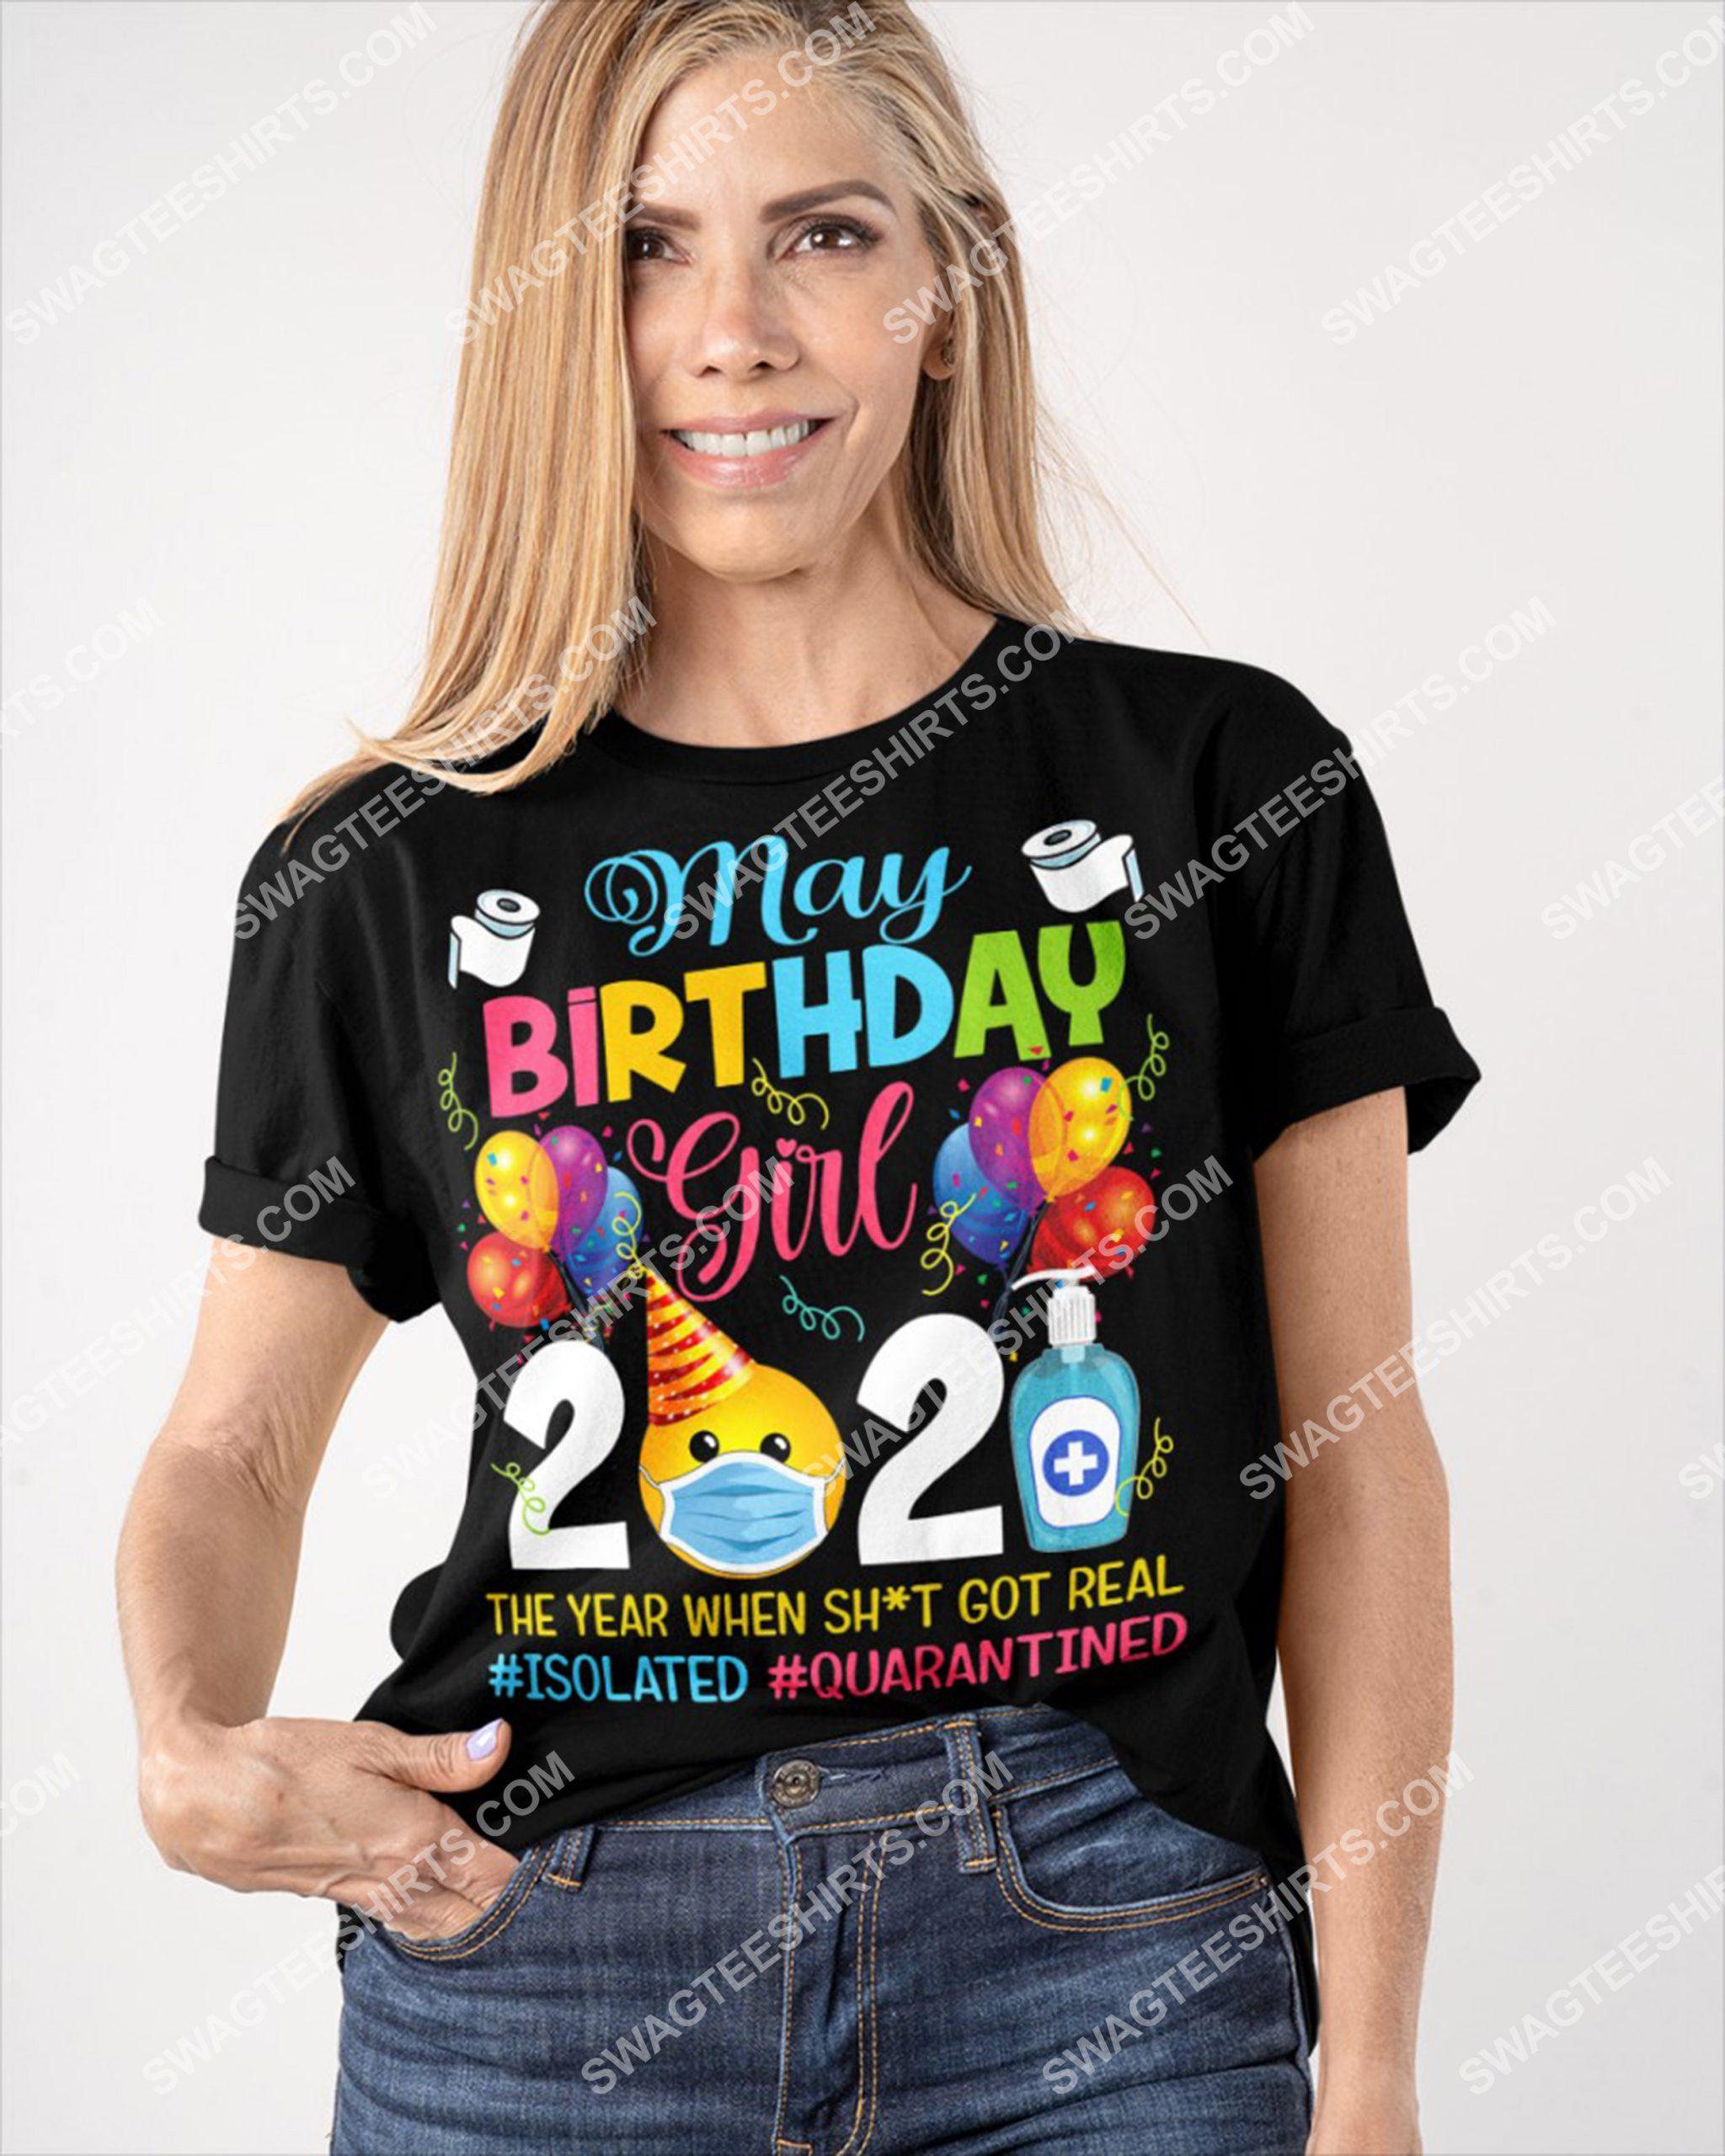 may birthday girl 2021 the year when shit got real quarantine shirt 2(2) - Copy